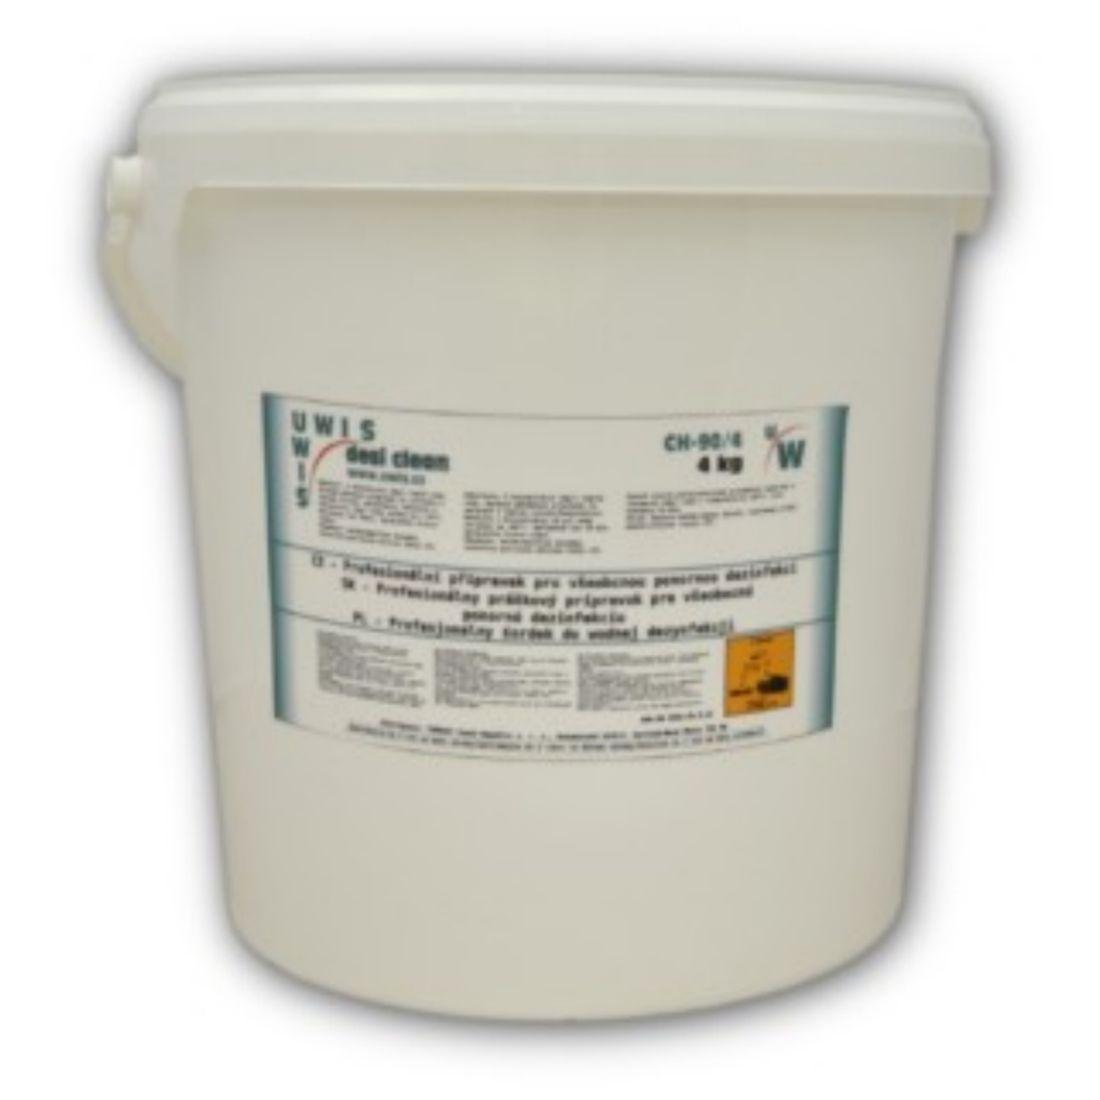 UWIS dezinfekční čistič 4 kg